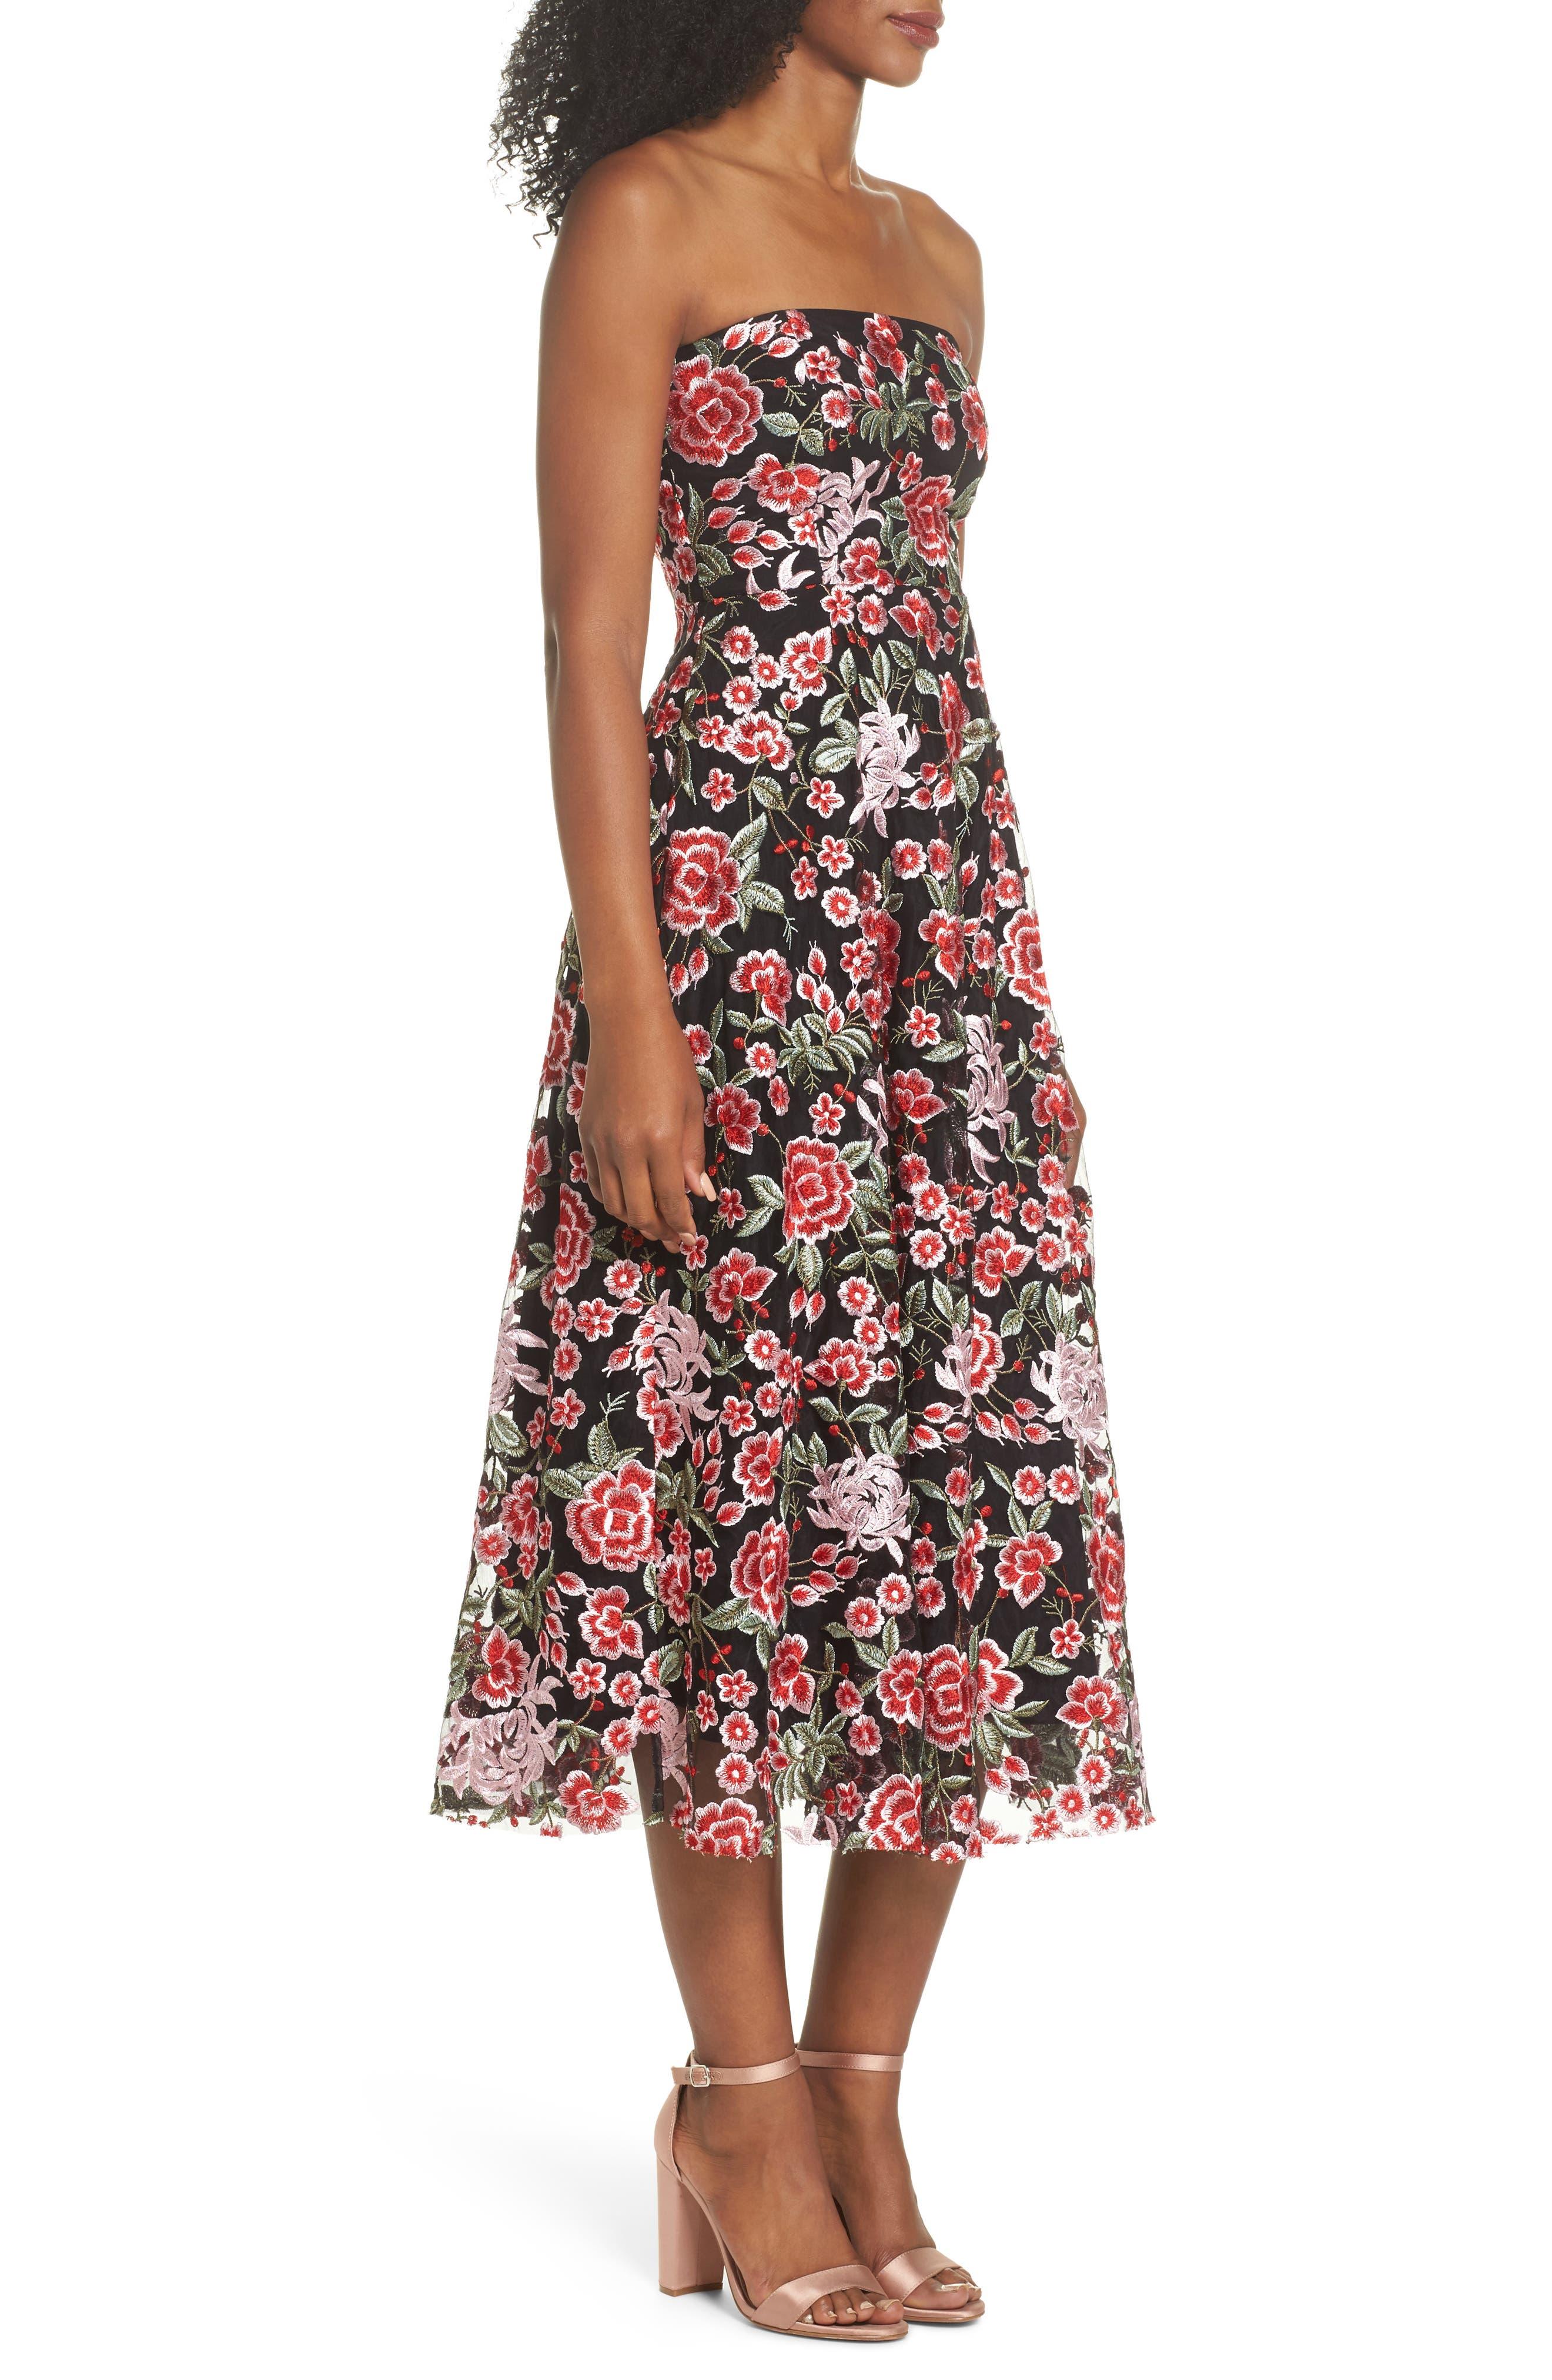 Cosette Embroidered Strapless Dress,                             Alternate thumbnail 3, color,                             Black Multi